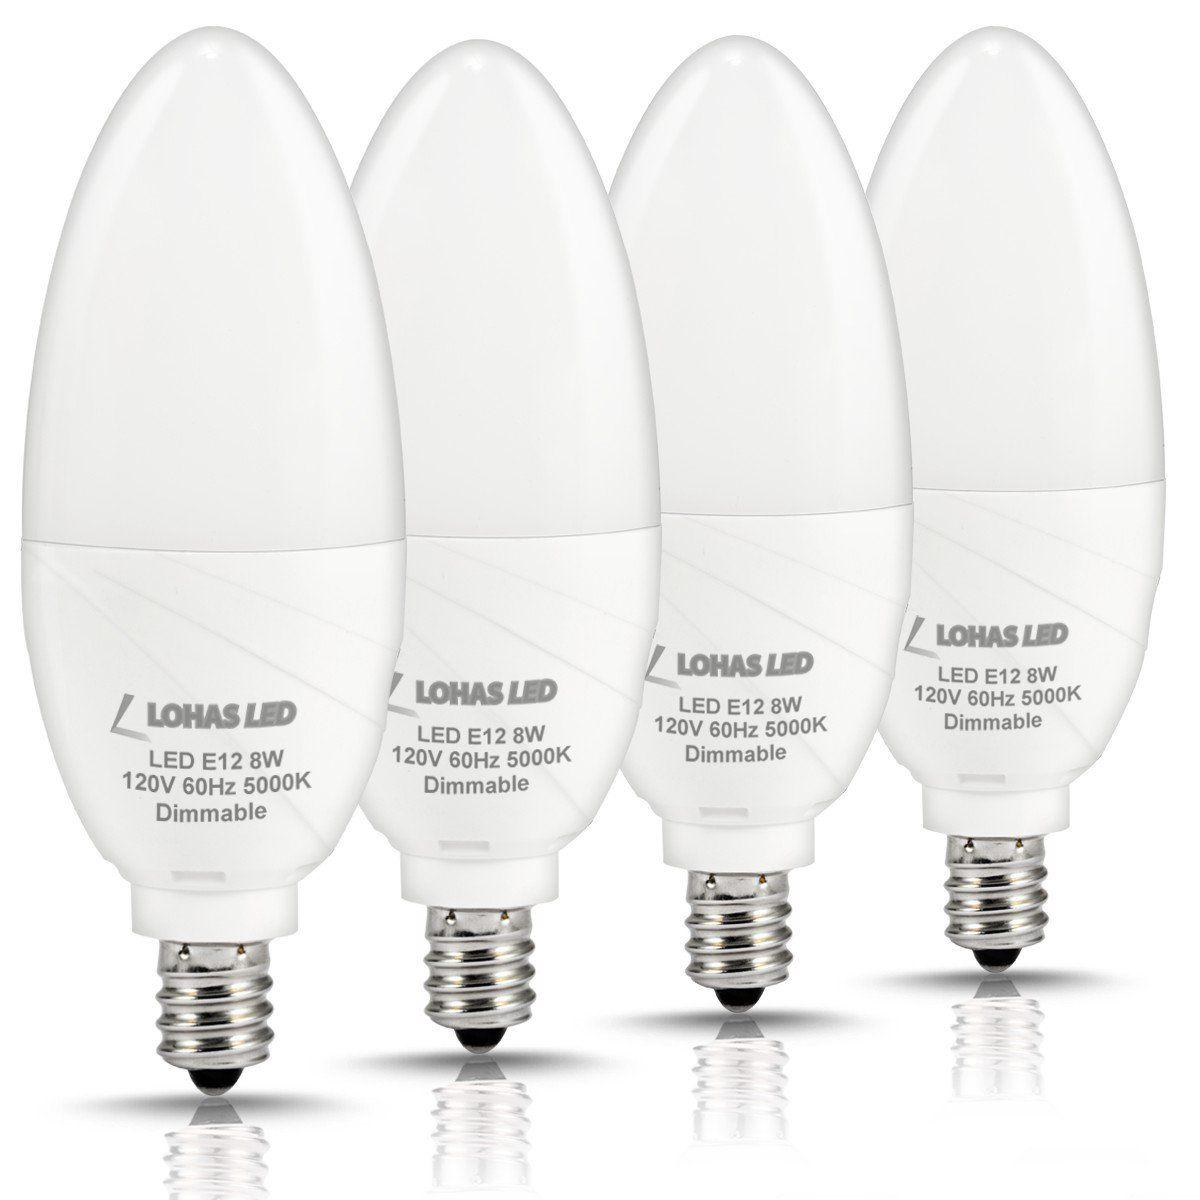 Lohas led candelabra bulb dimmable led 75watt light bulbs lohas led candelabra bulb dimmable led 75watt light bulbs equivalent8w led aloadofball Gallery